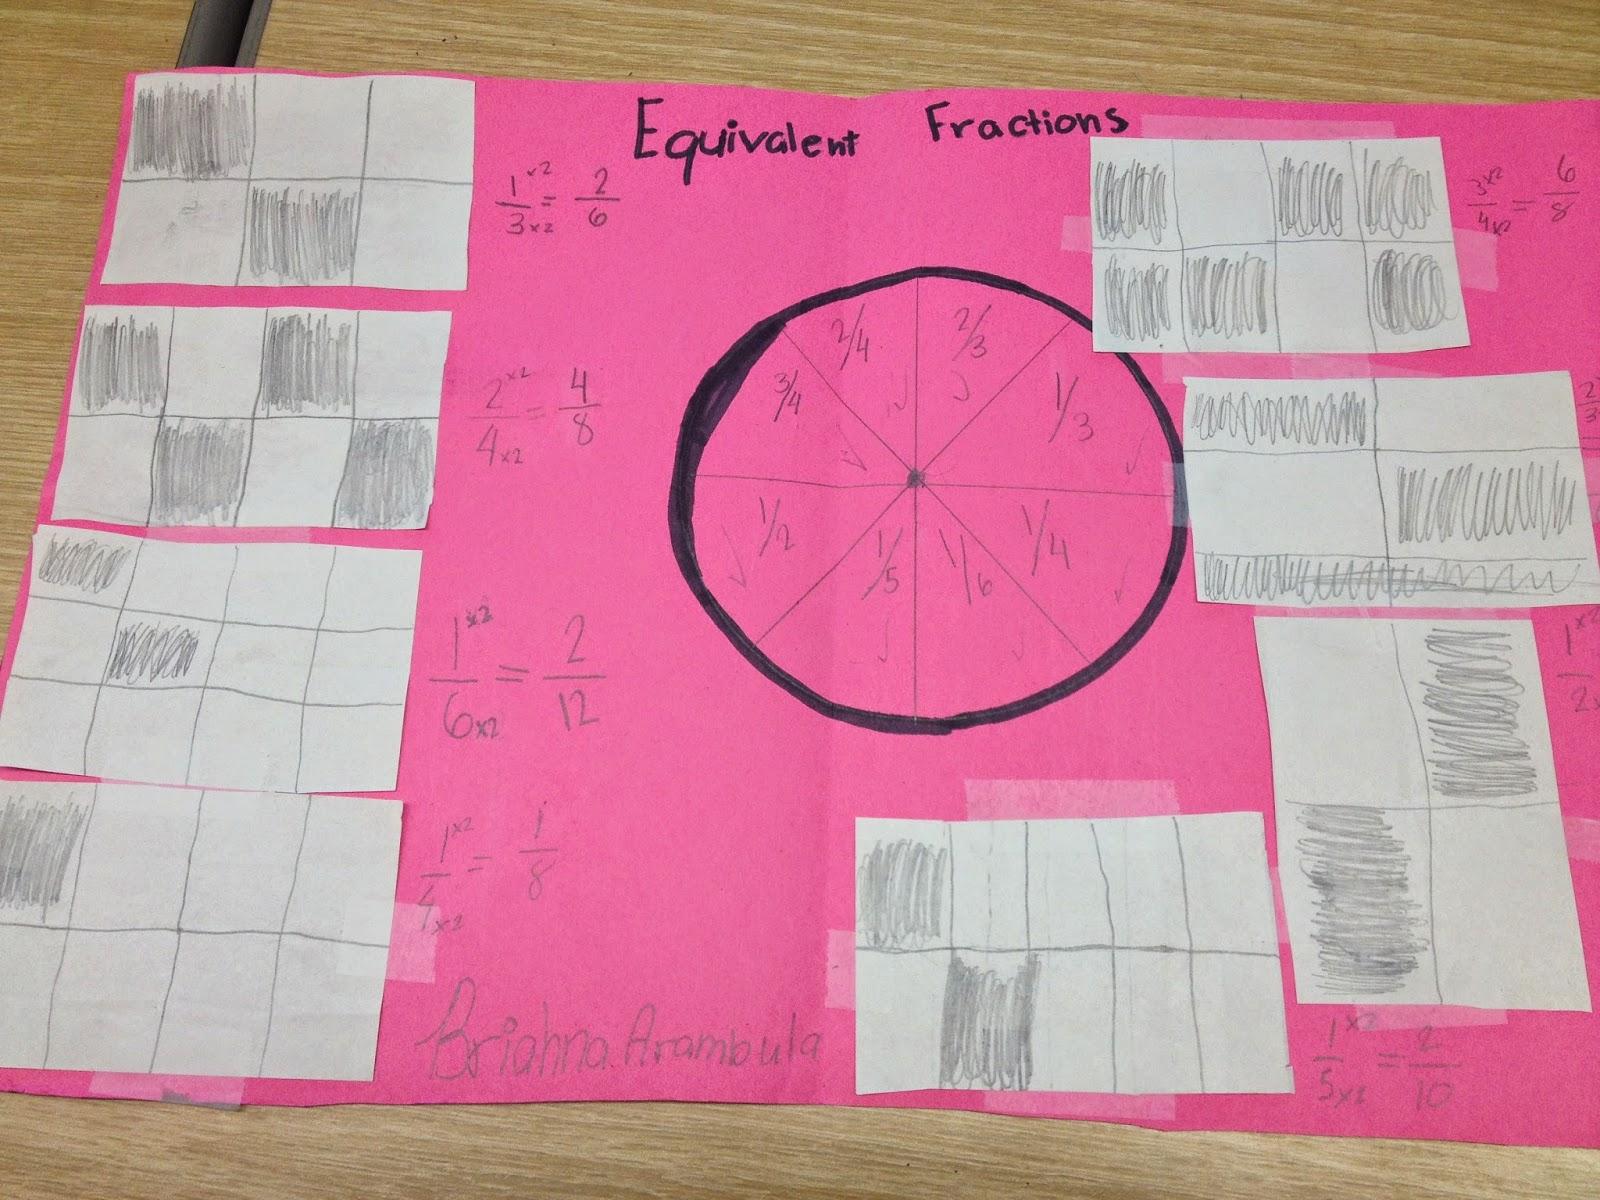 Lisateachr S Classroom Equivalent Fractions Activity